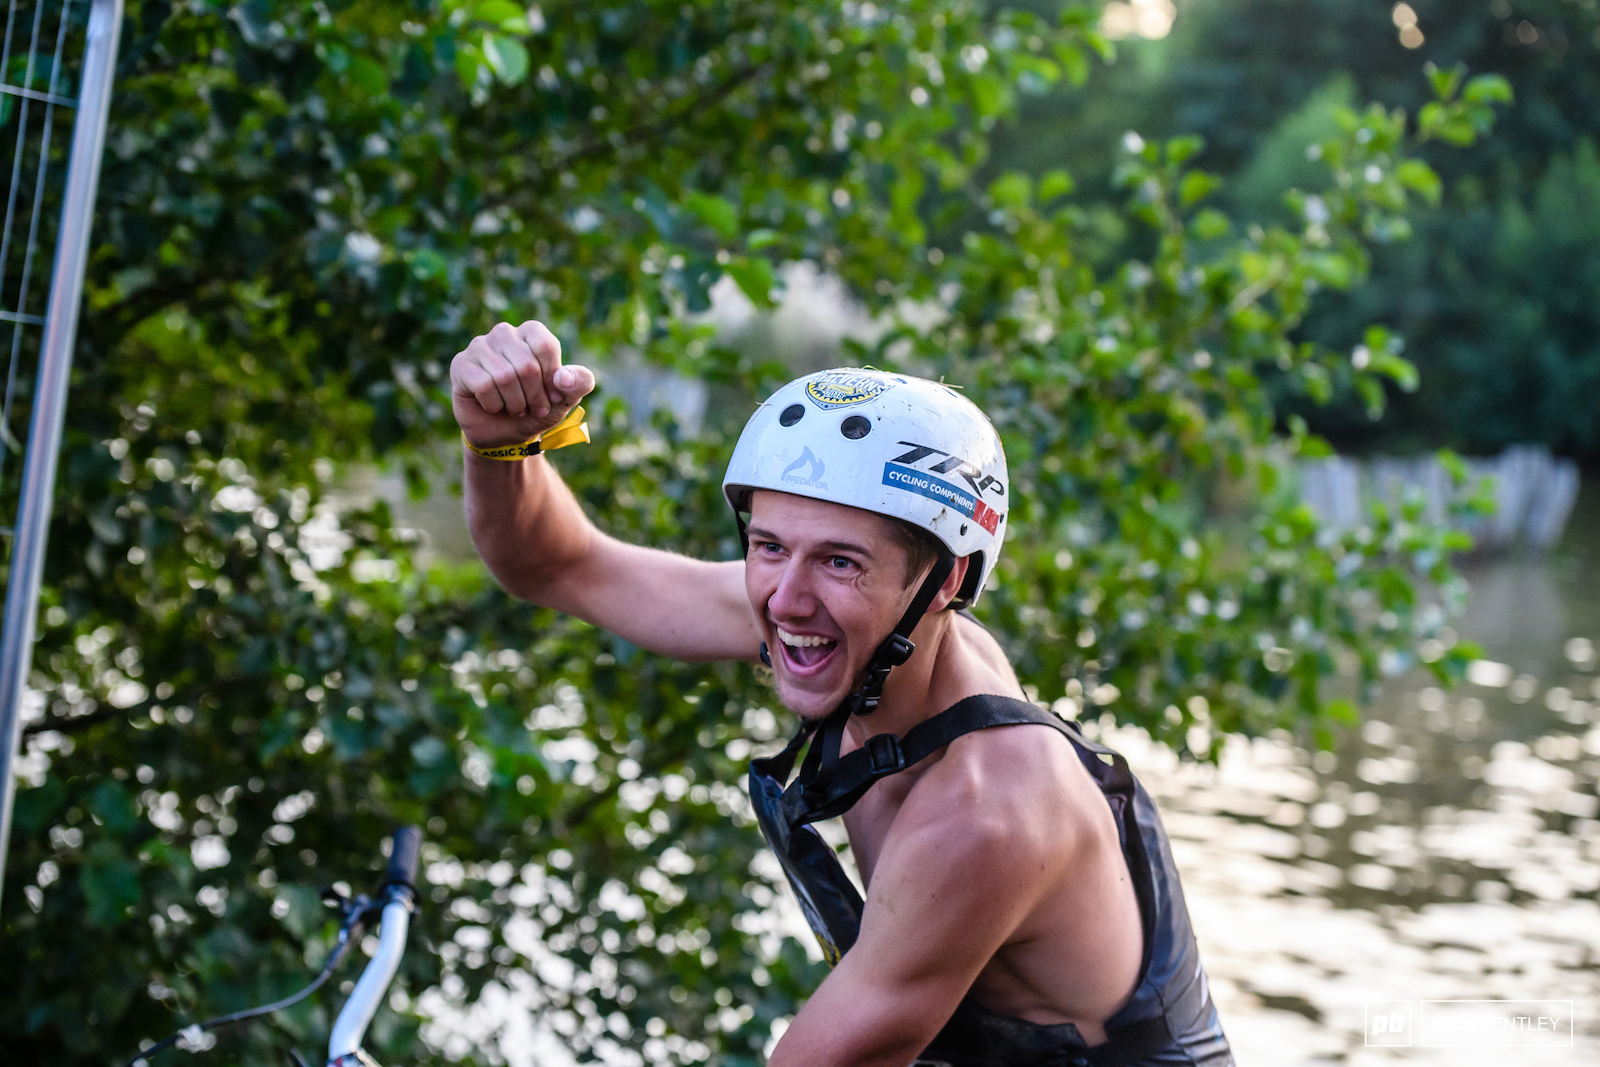 Lake Rider winner Kieran Dougherty was pretty happy with himself